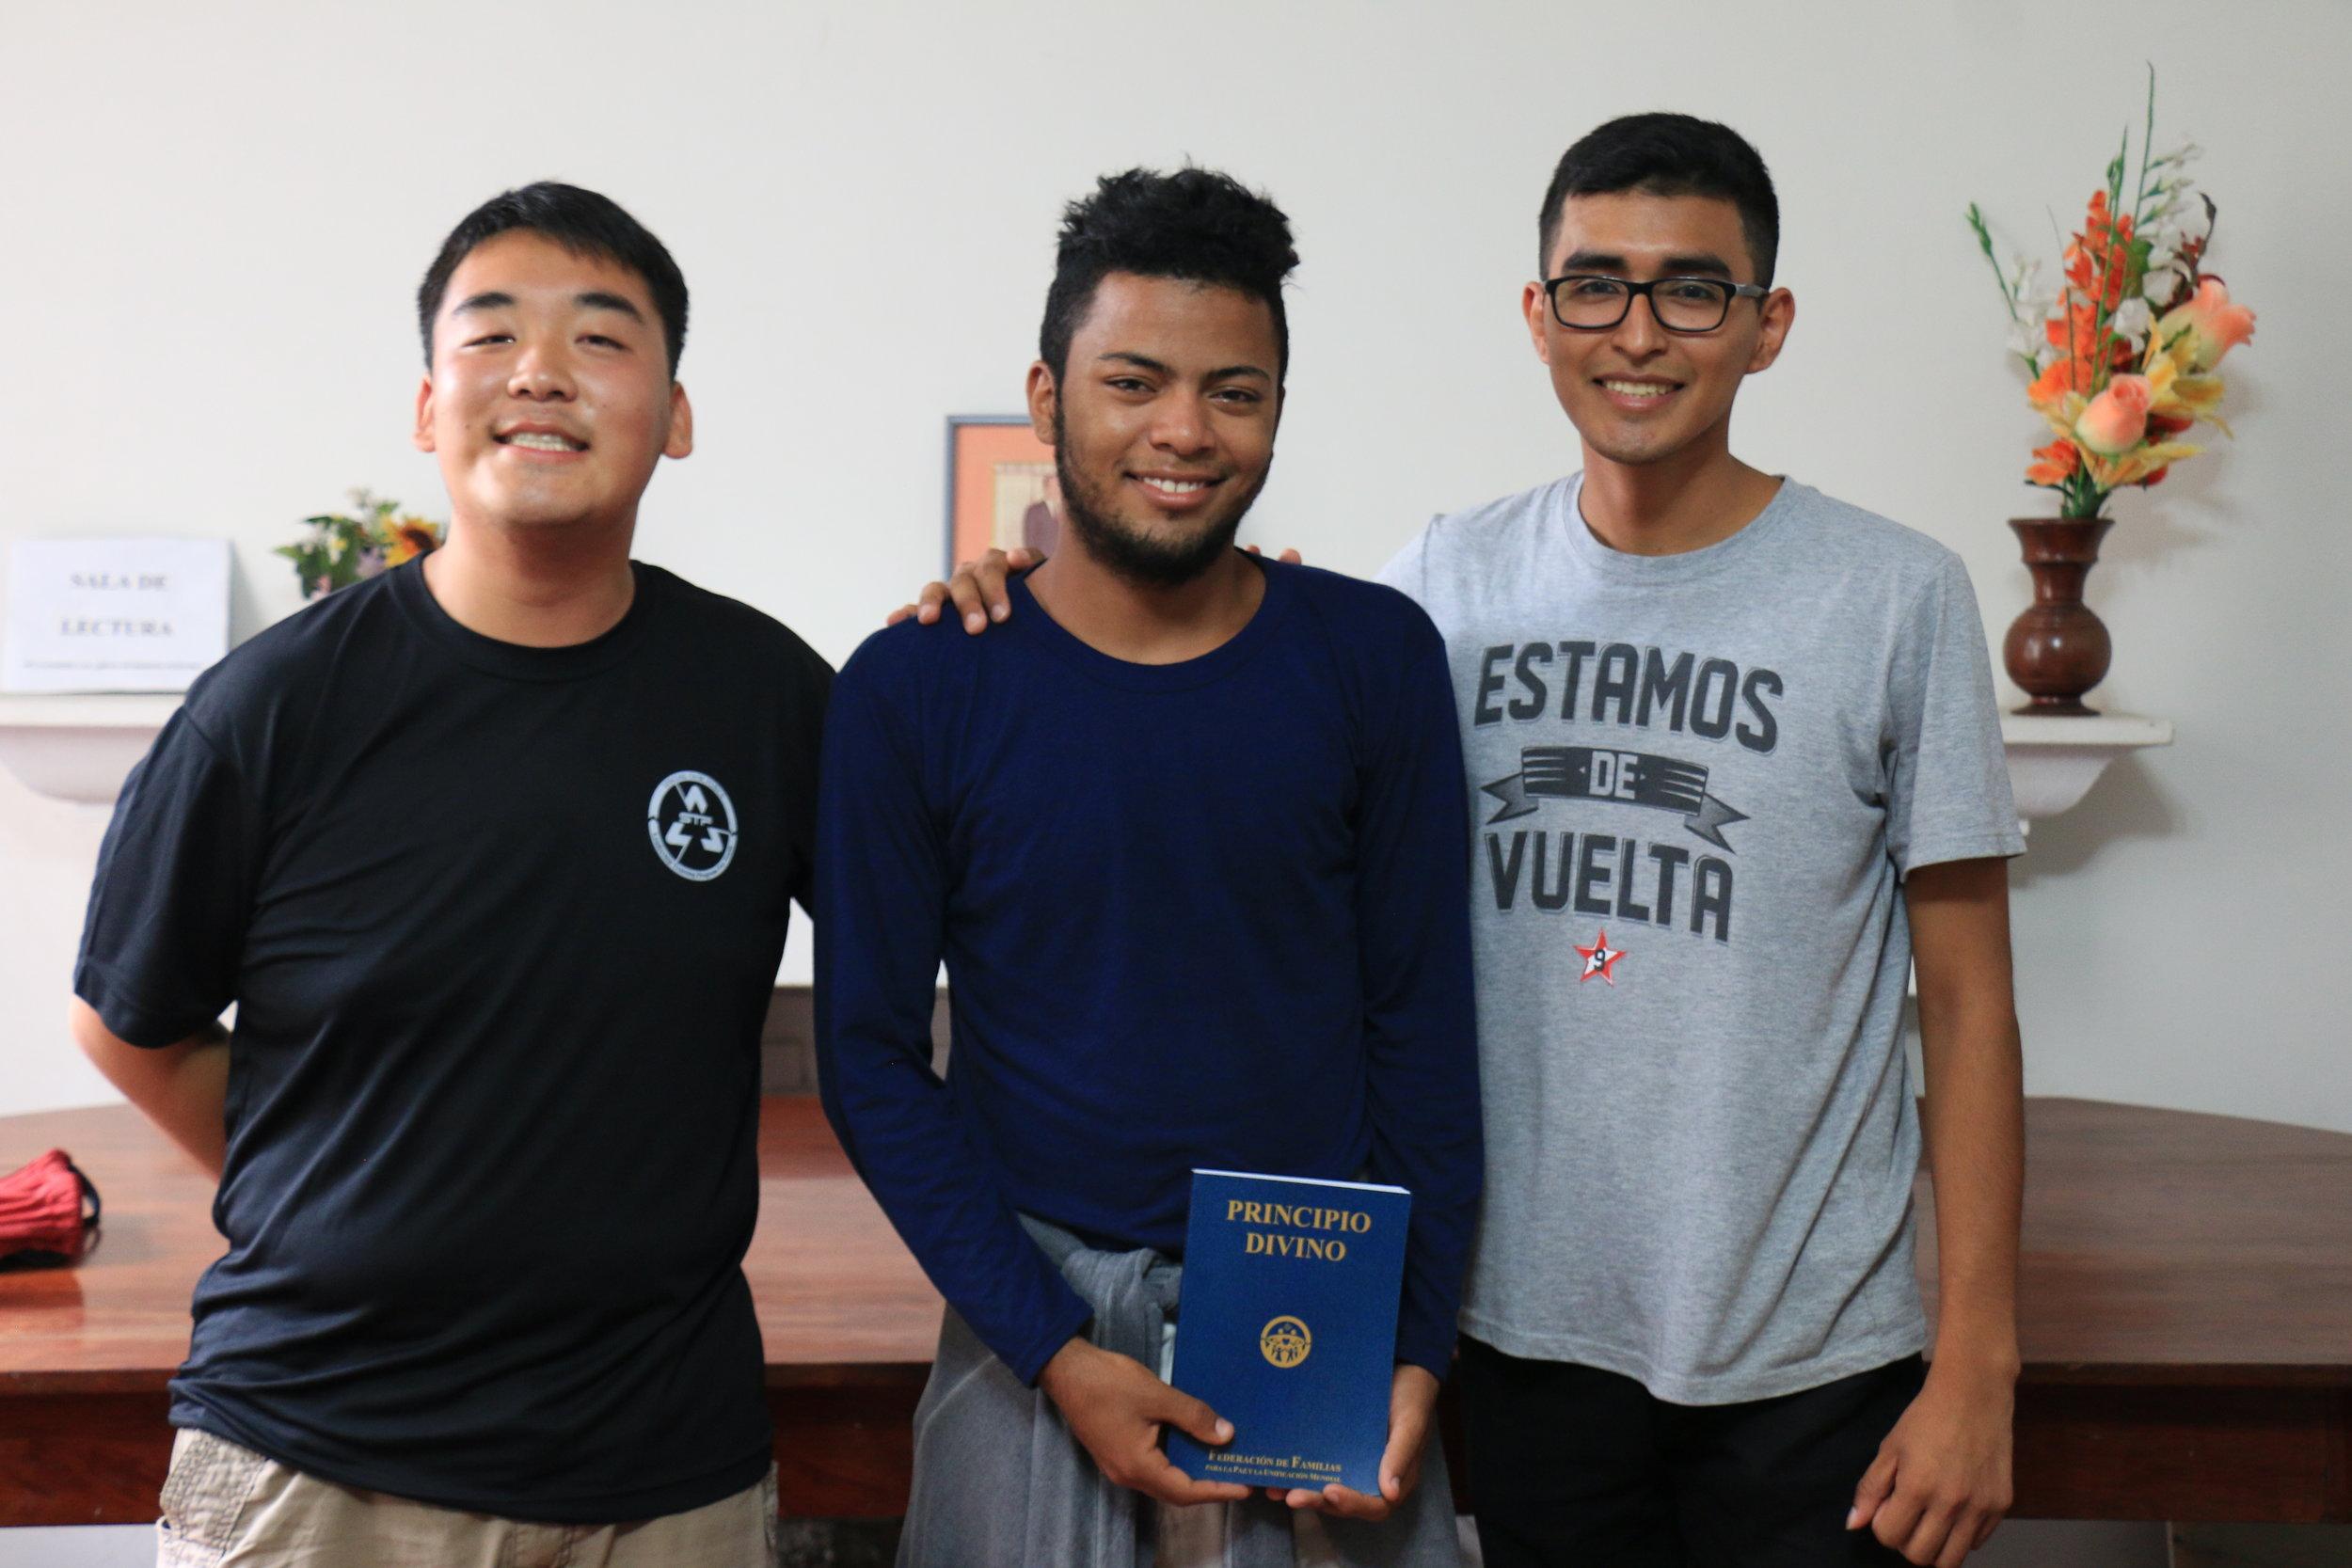 Sotetsu Honda, Christofer Gonzalez, and Dokhwa Miraval